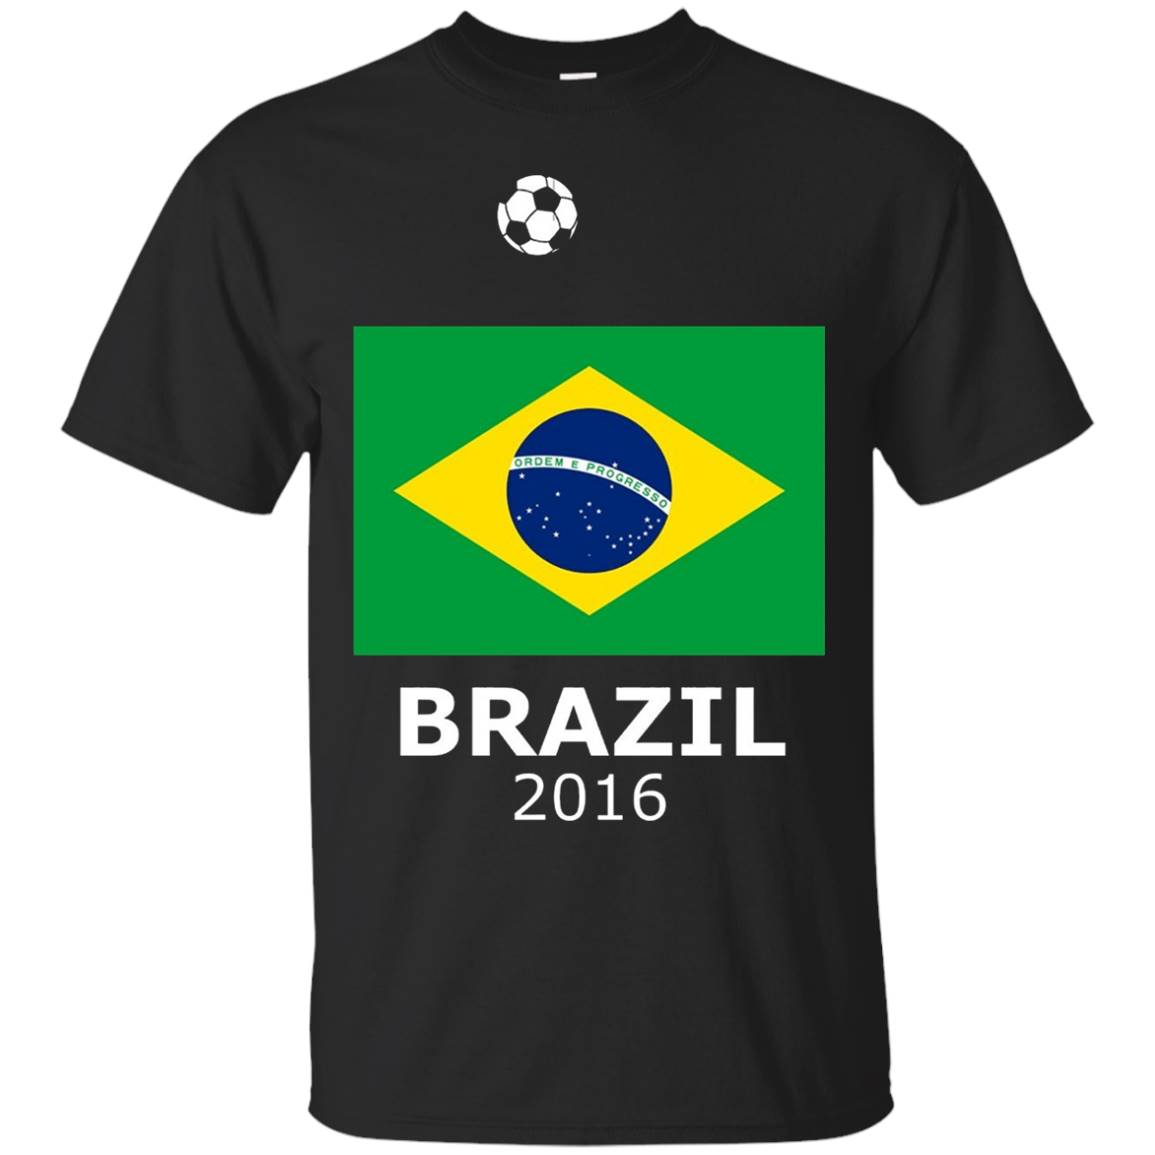 Brazil 2016 Football (Soccer) T-Shirt